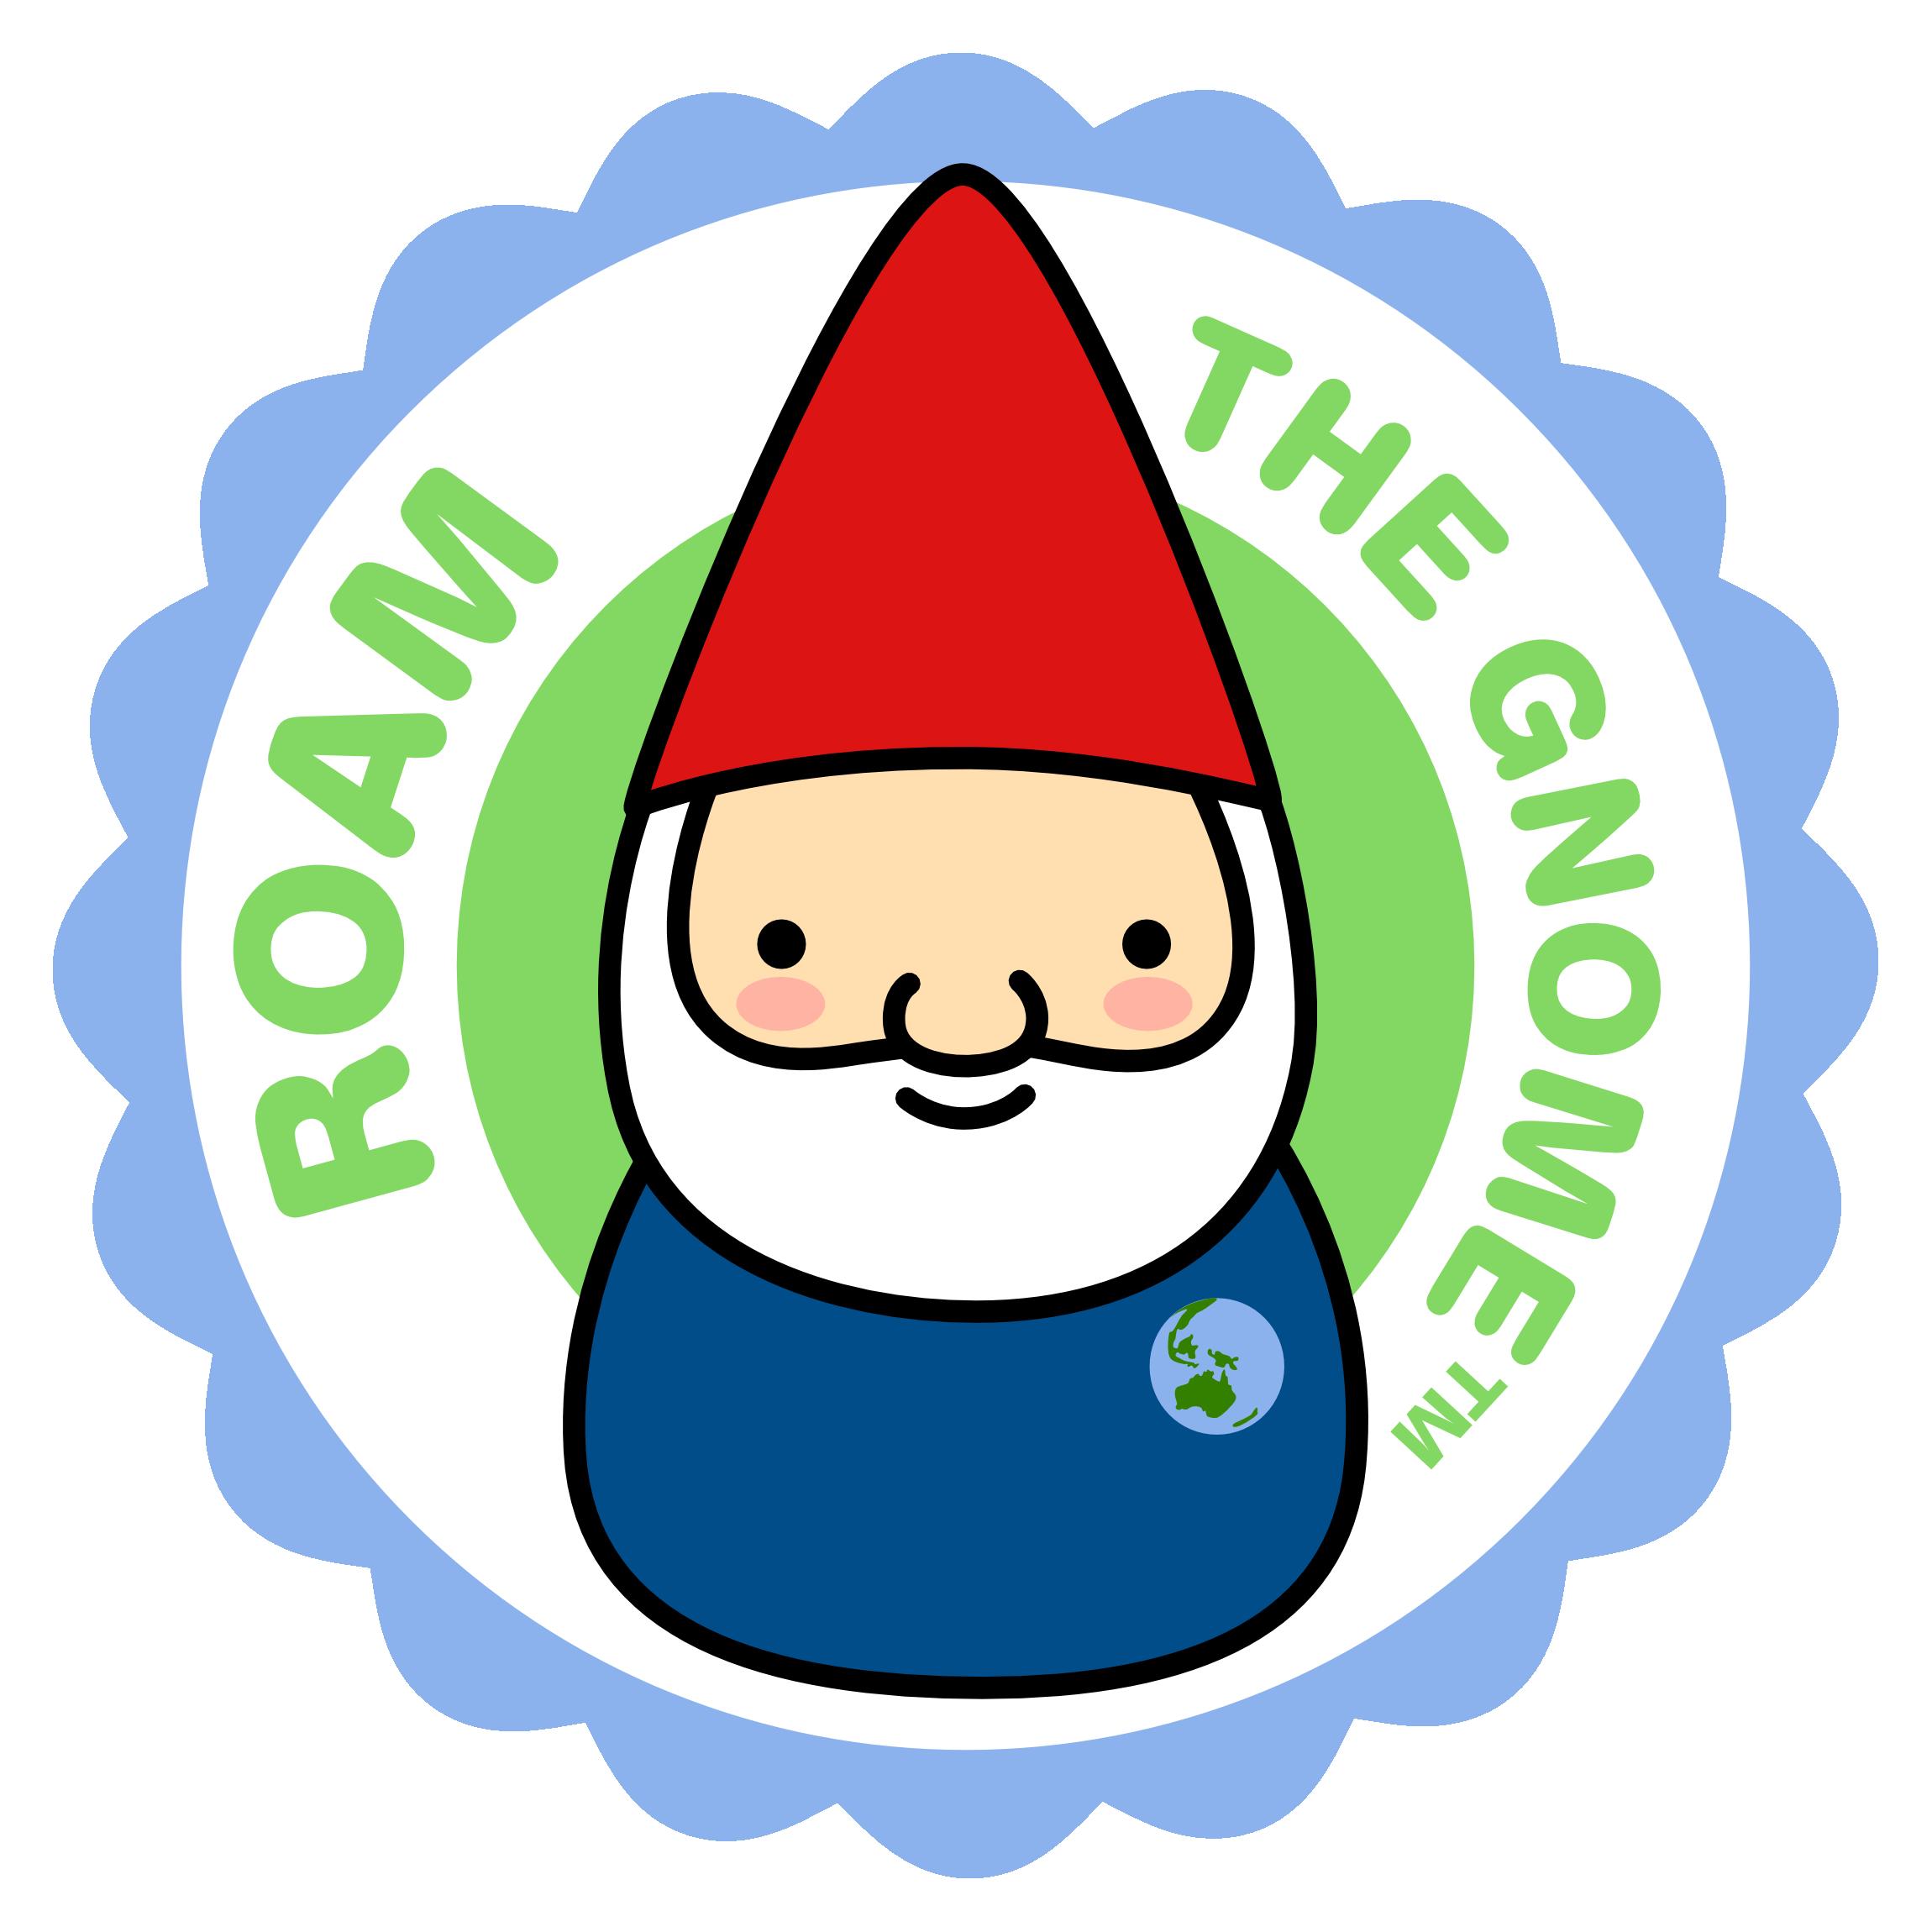 Santa clipart baseball. Gnome transparent free on